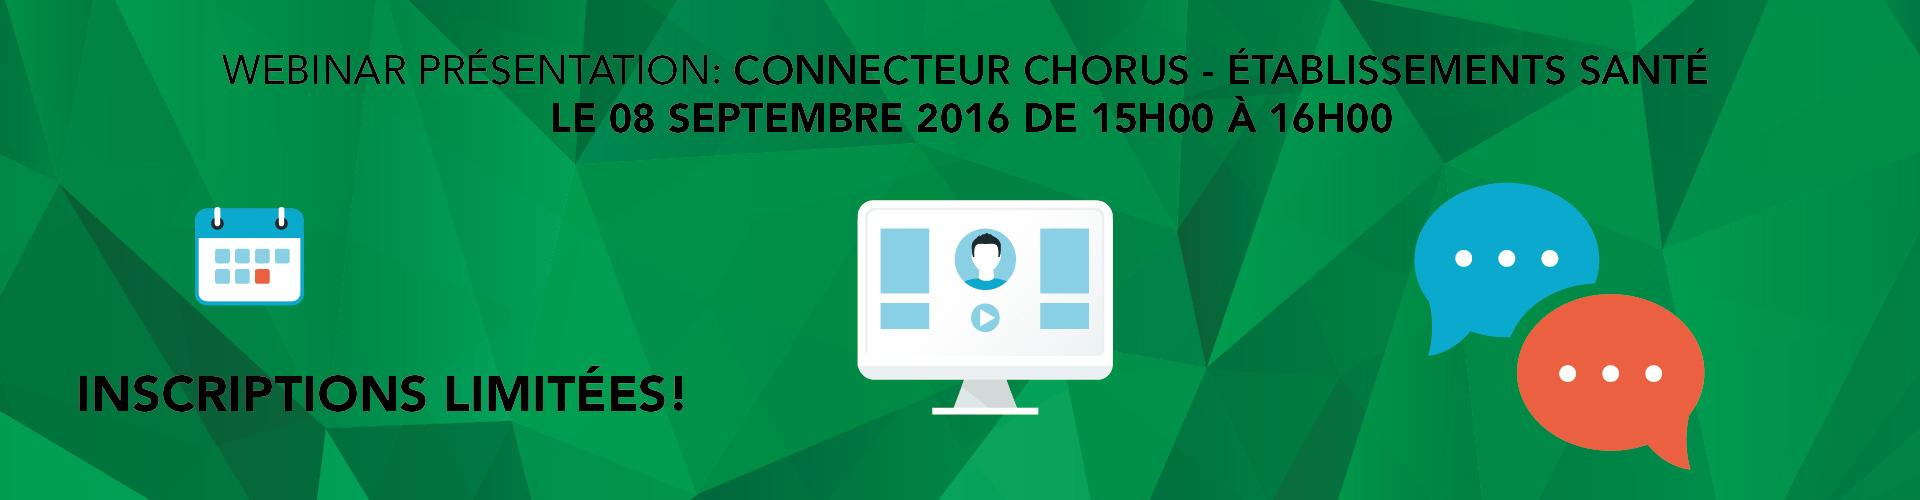 Slide-Sante-Webinar-connecteur-chorus-080916